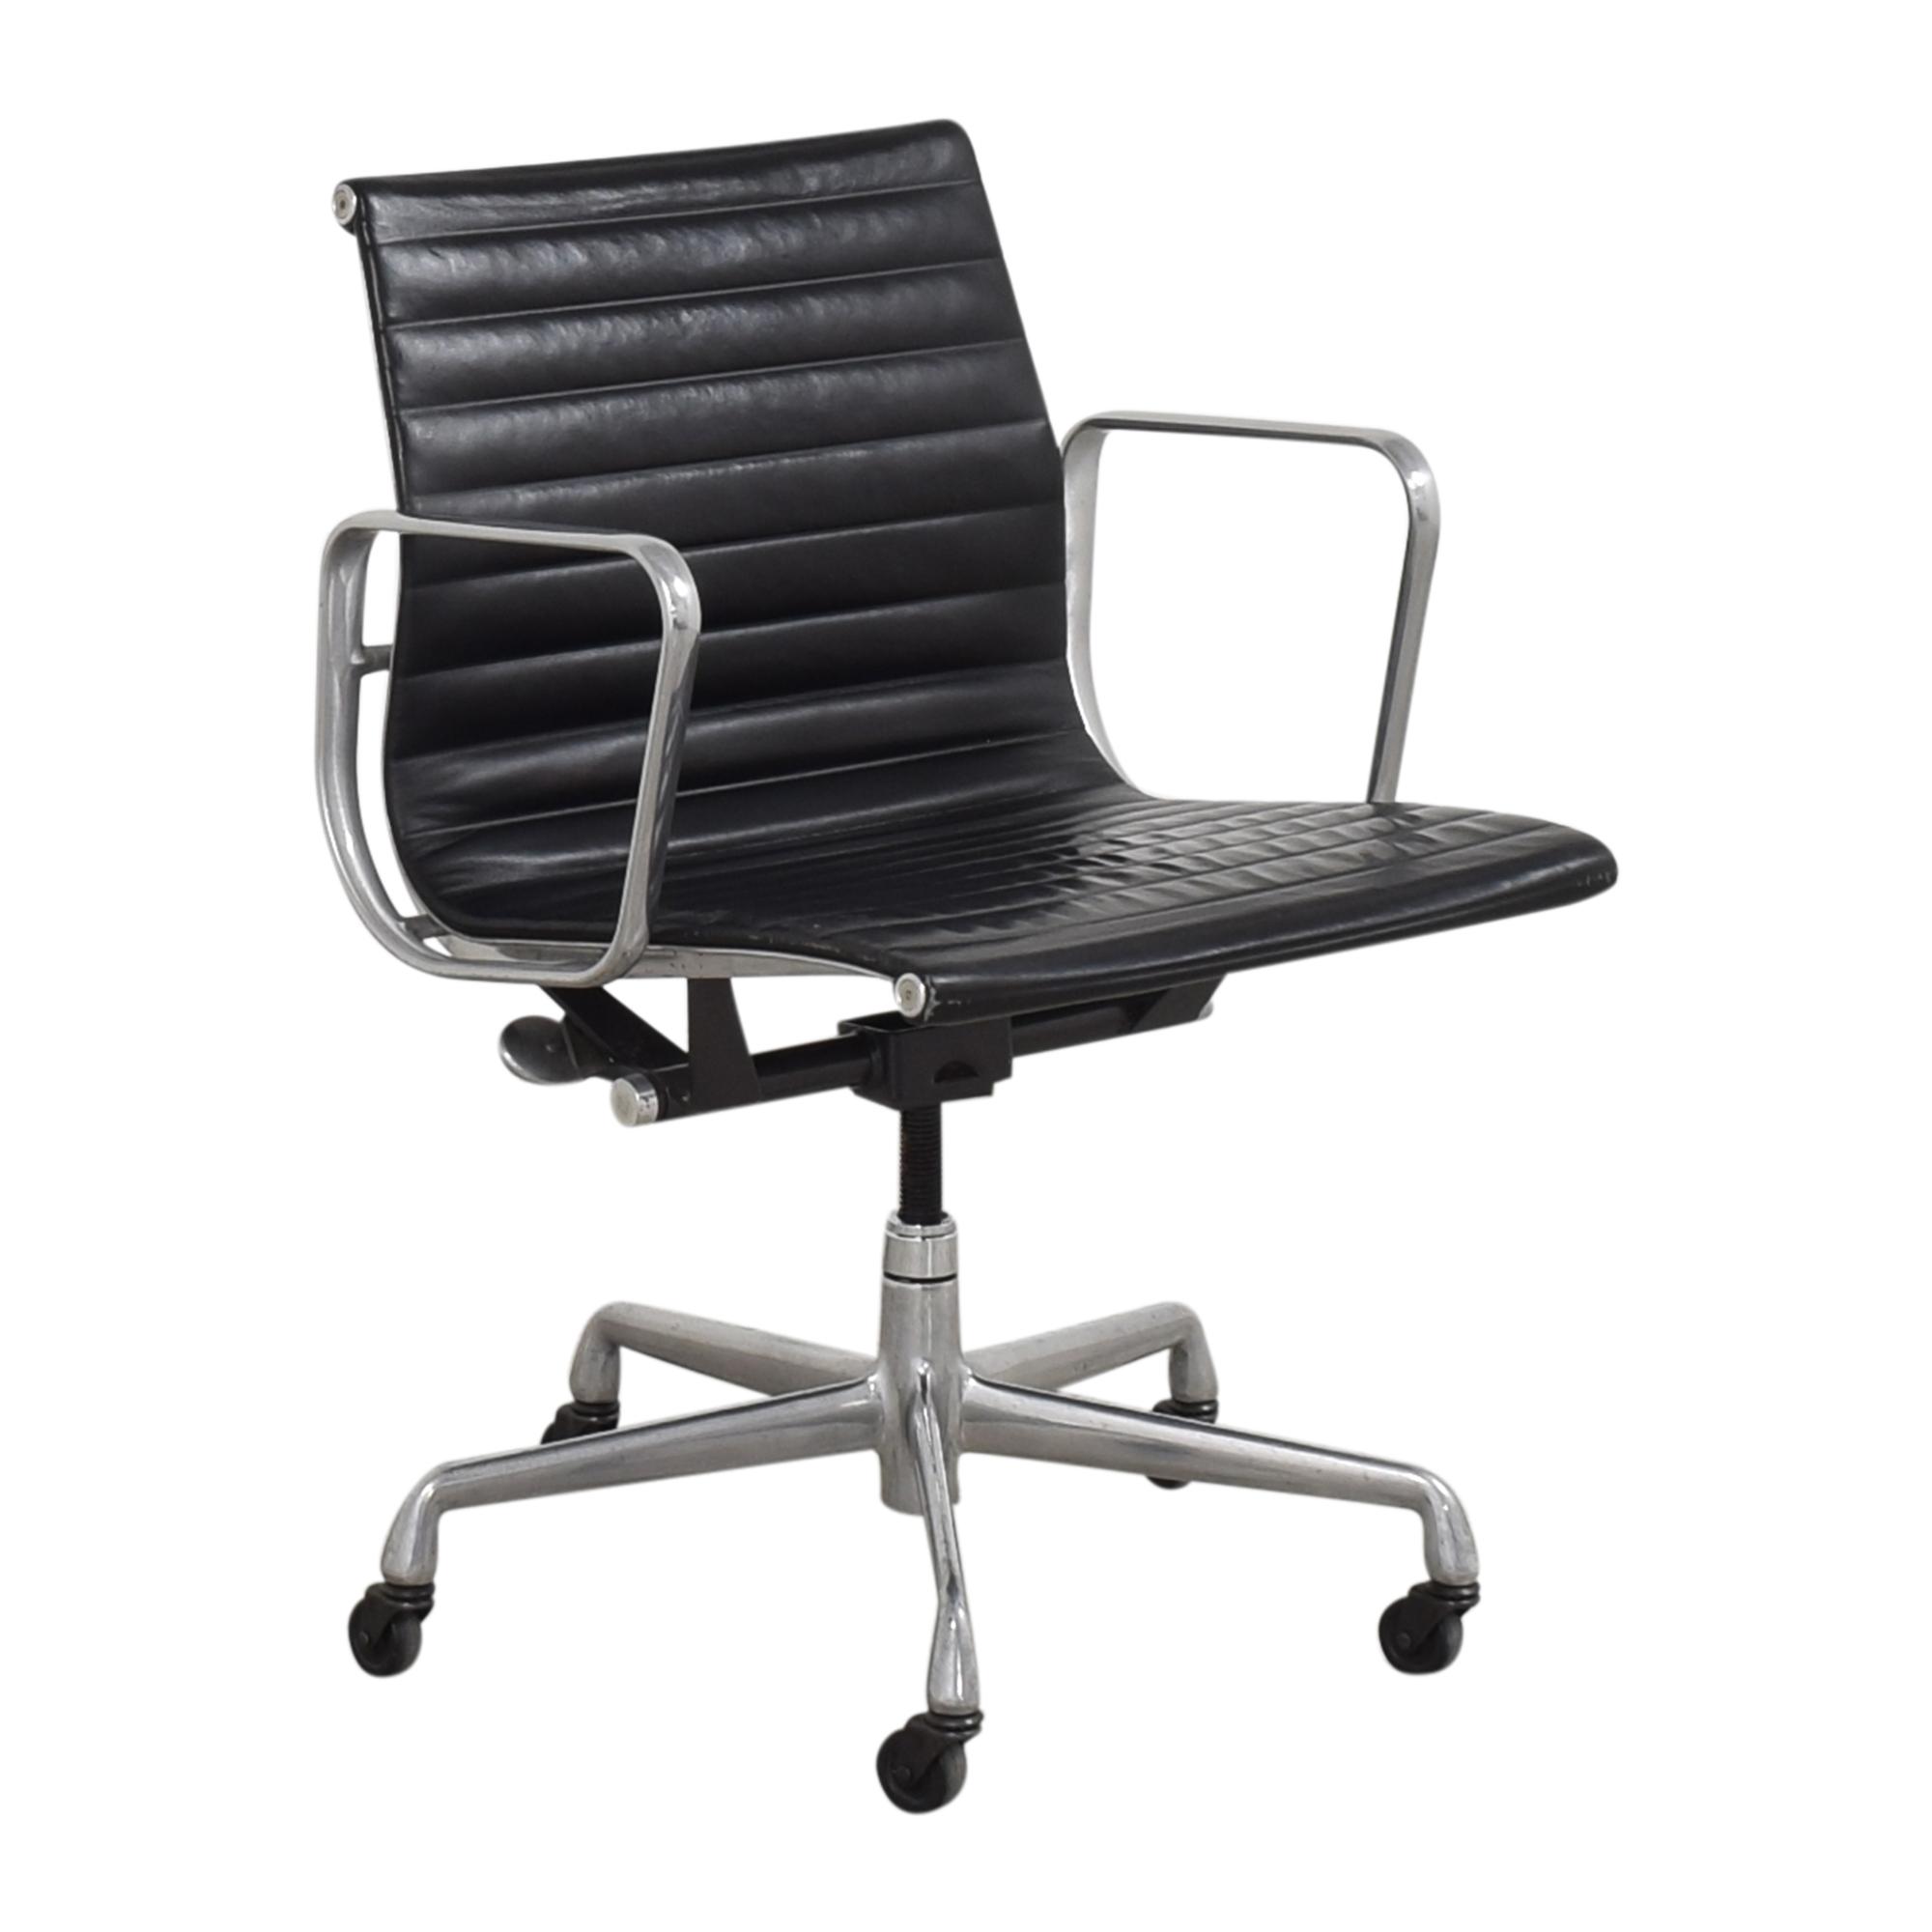 Herman Miller Herman Miller Eames Aluminum Group Management Chair Chairs